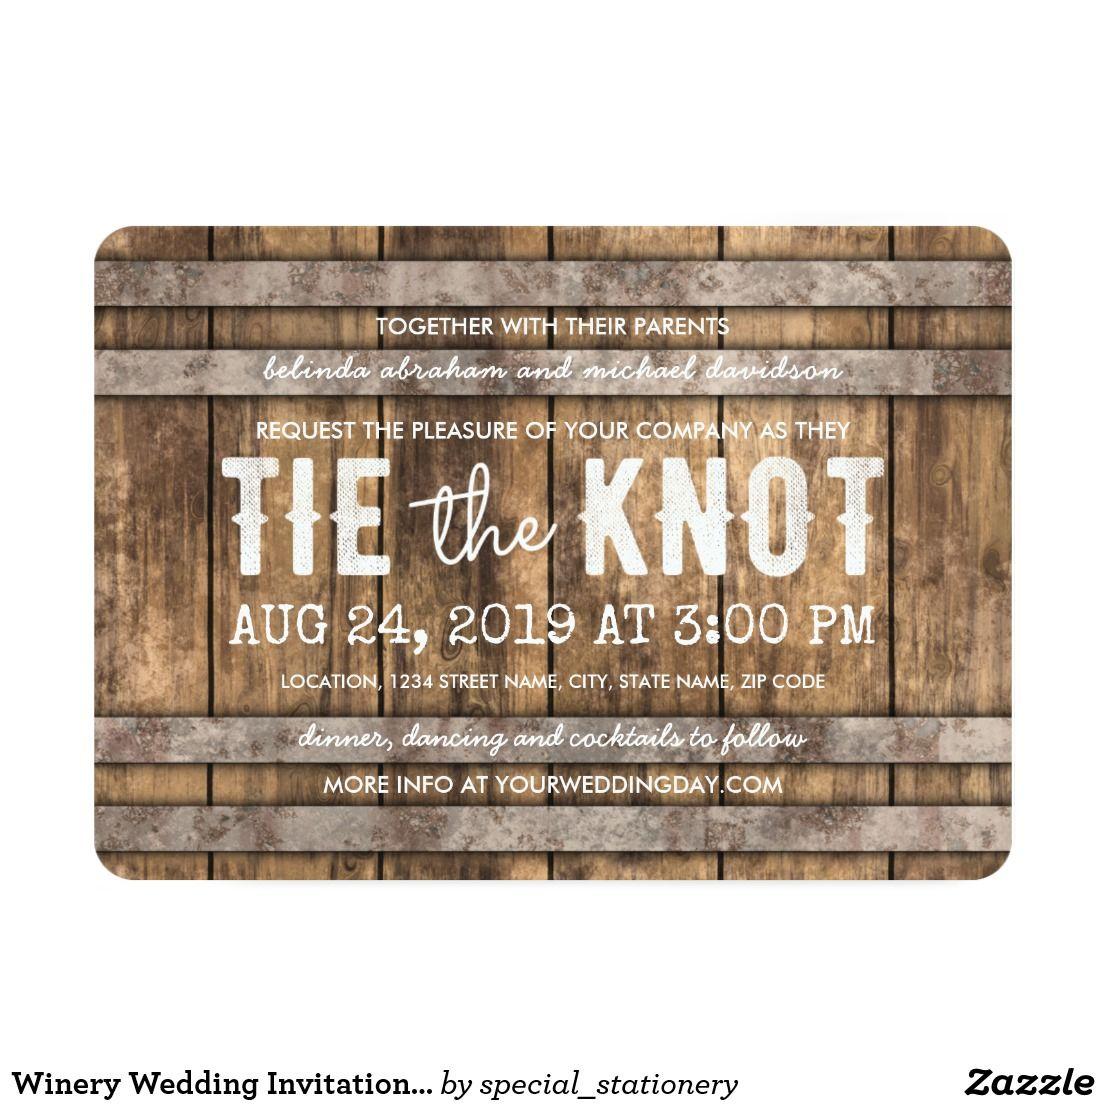 Winery Wedding Invitation | Rustic Wooden Barrel | Winery wedding ...